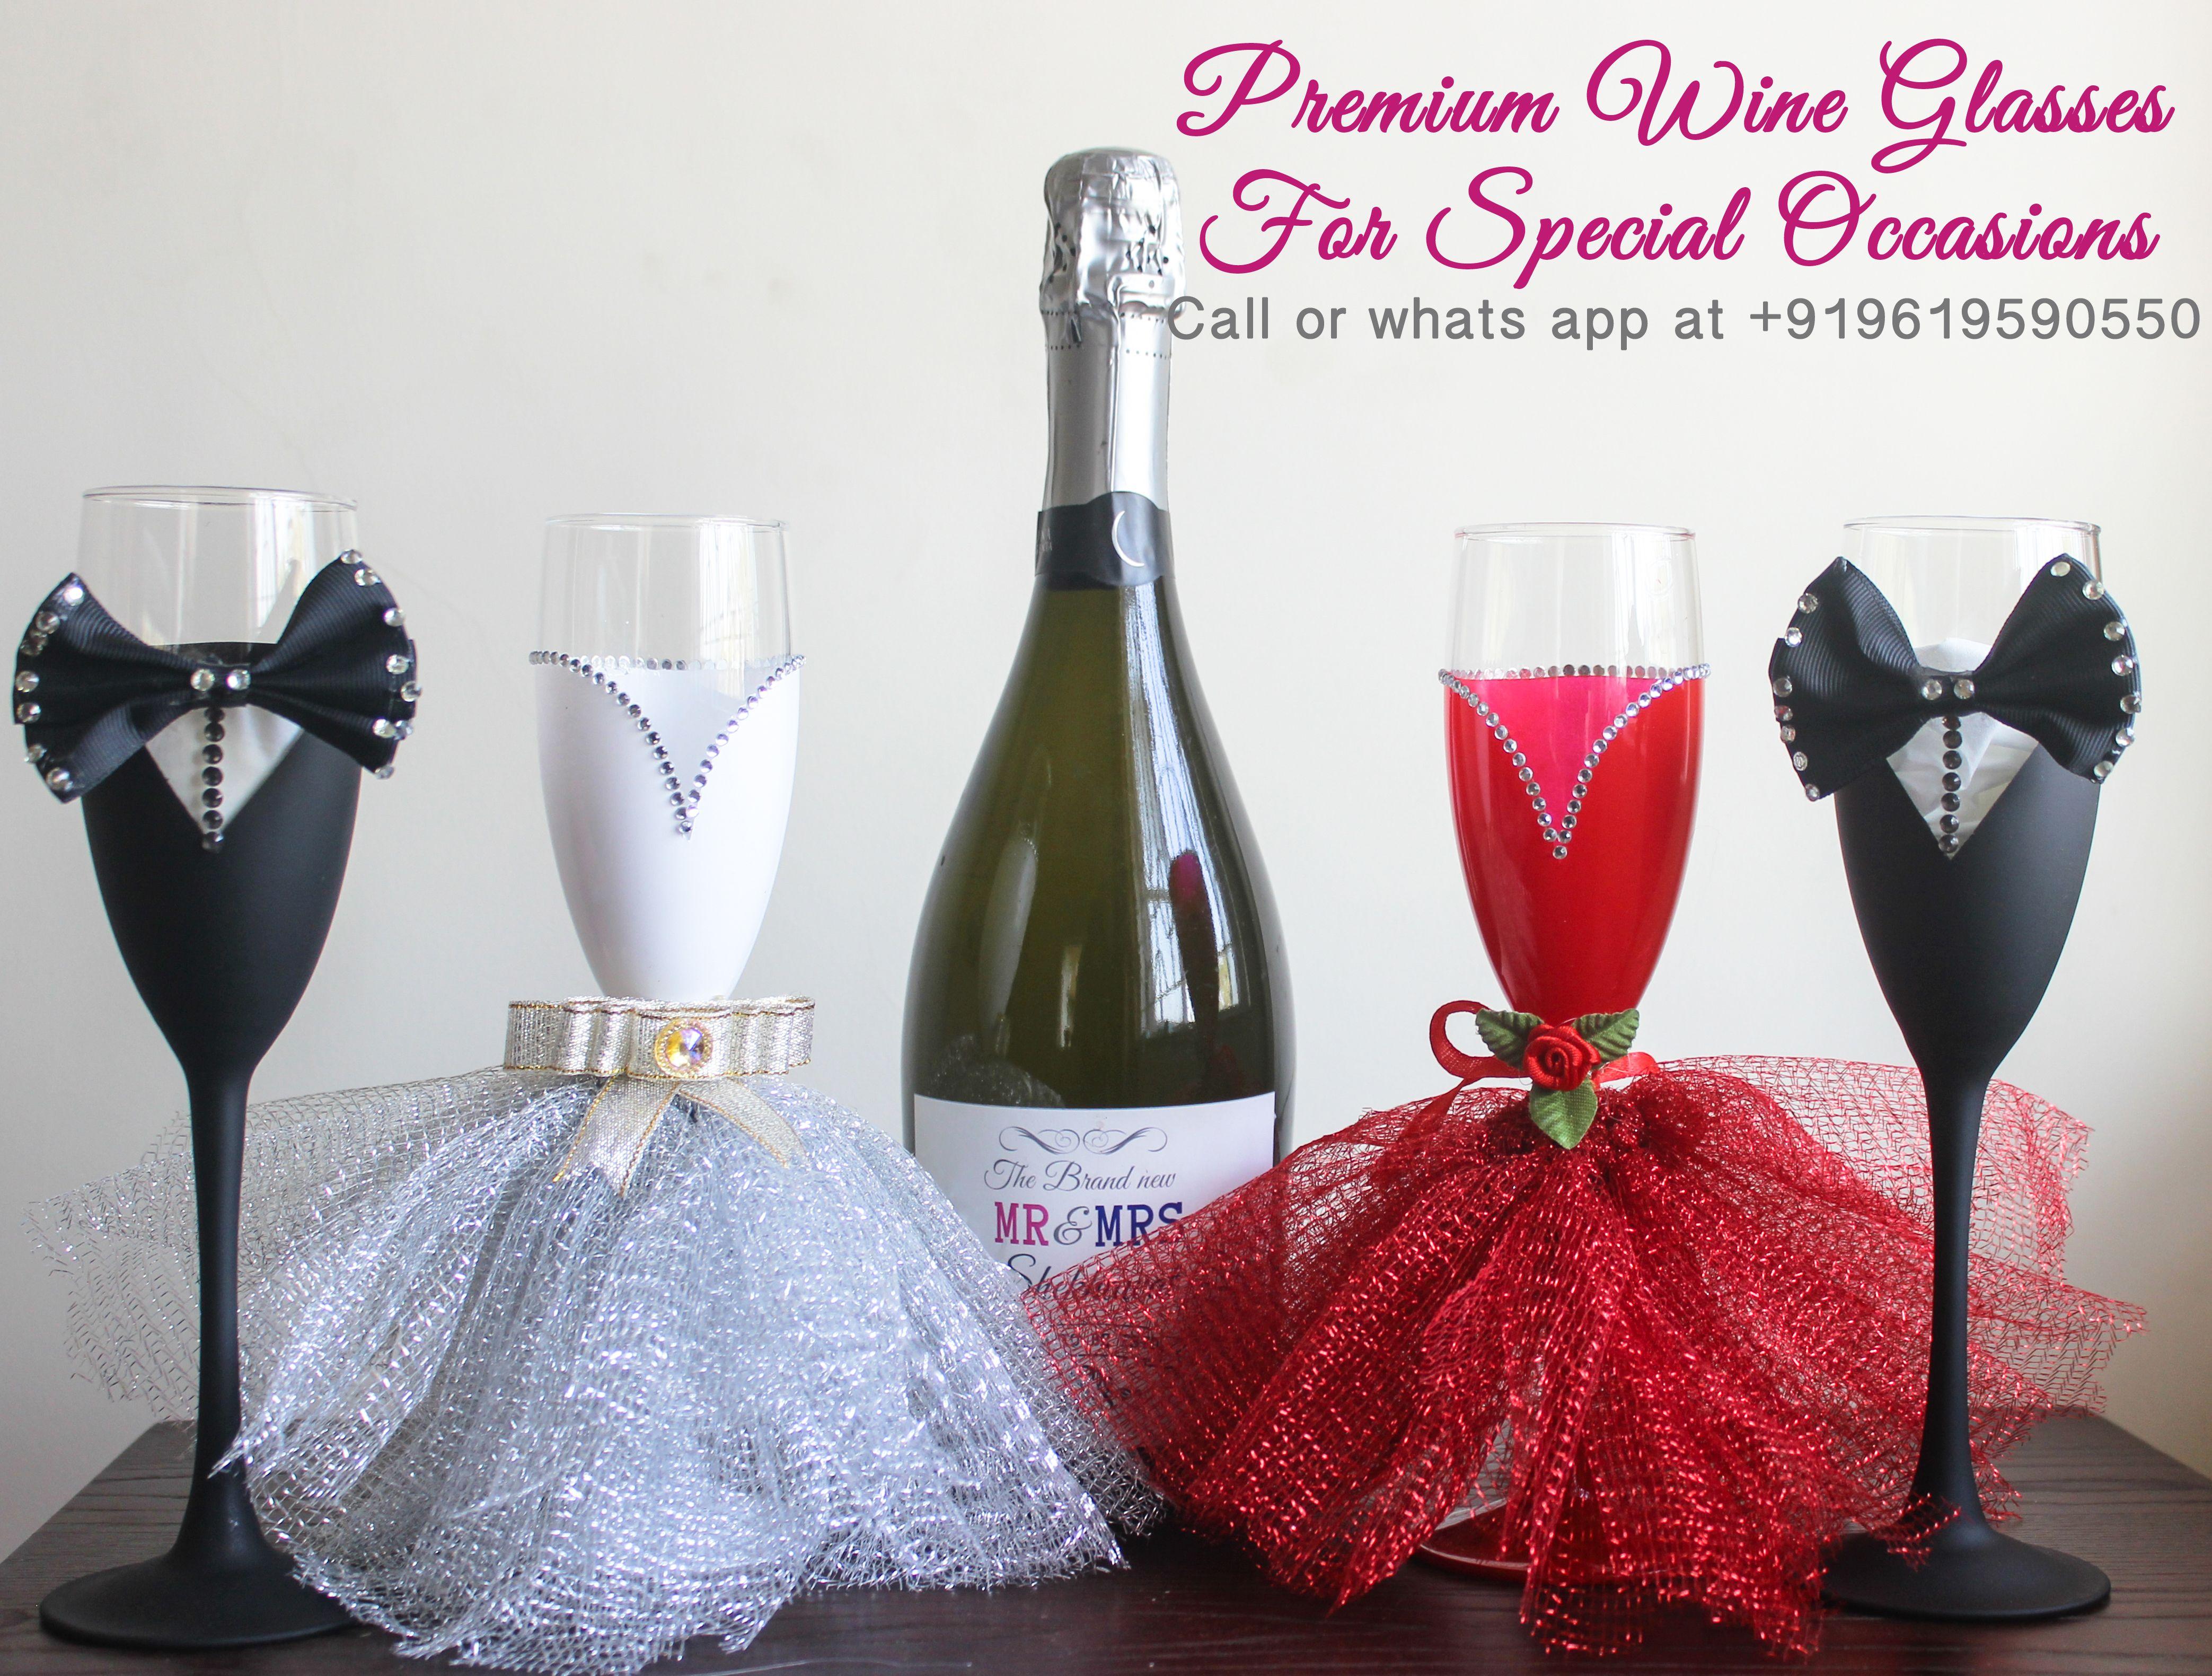 Premium Gifts For Special Occasion In India Love Anniversary Birthday Mumbai Delhi Chandigarh Gifts Special Occasion Premium Gift Personalized Gifts